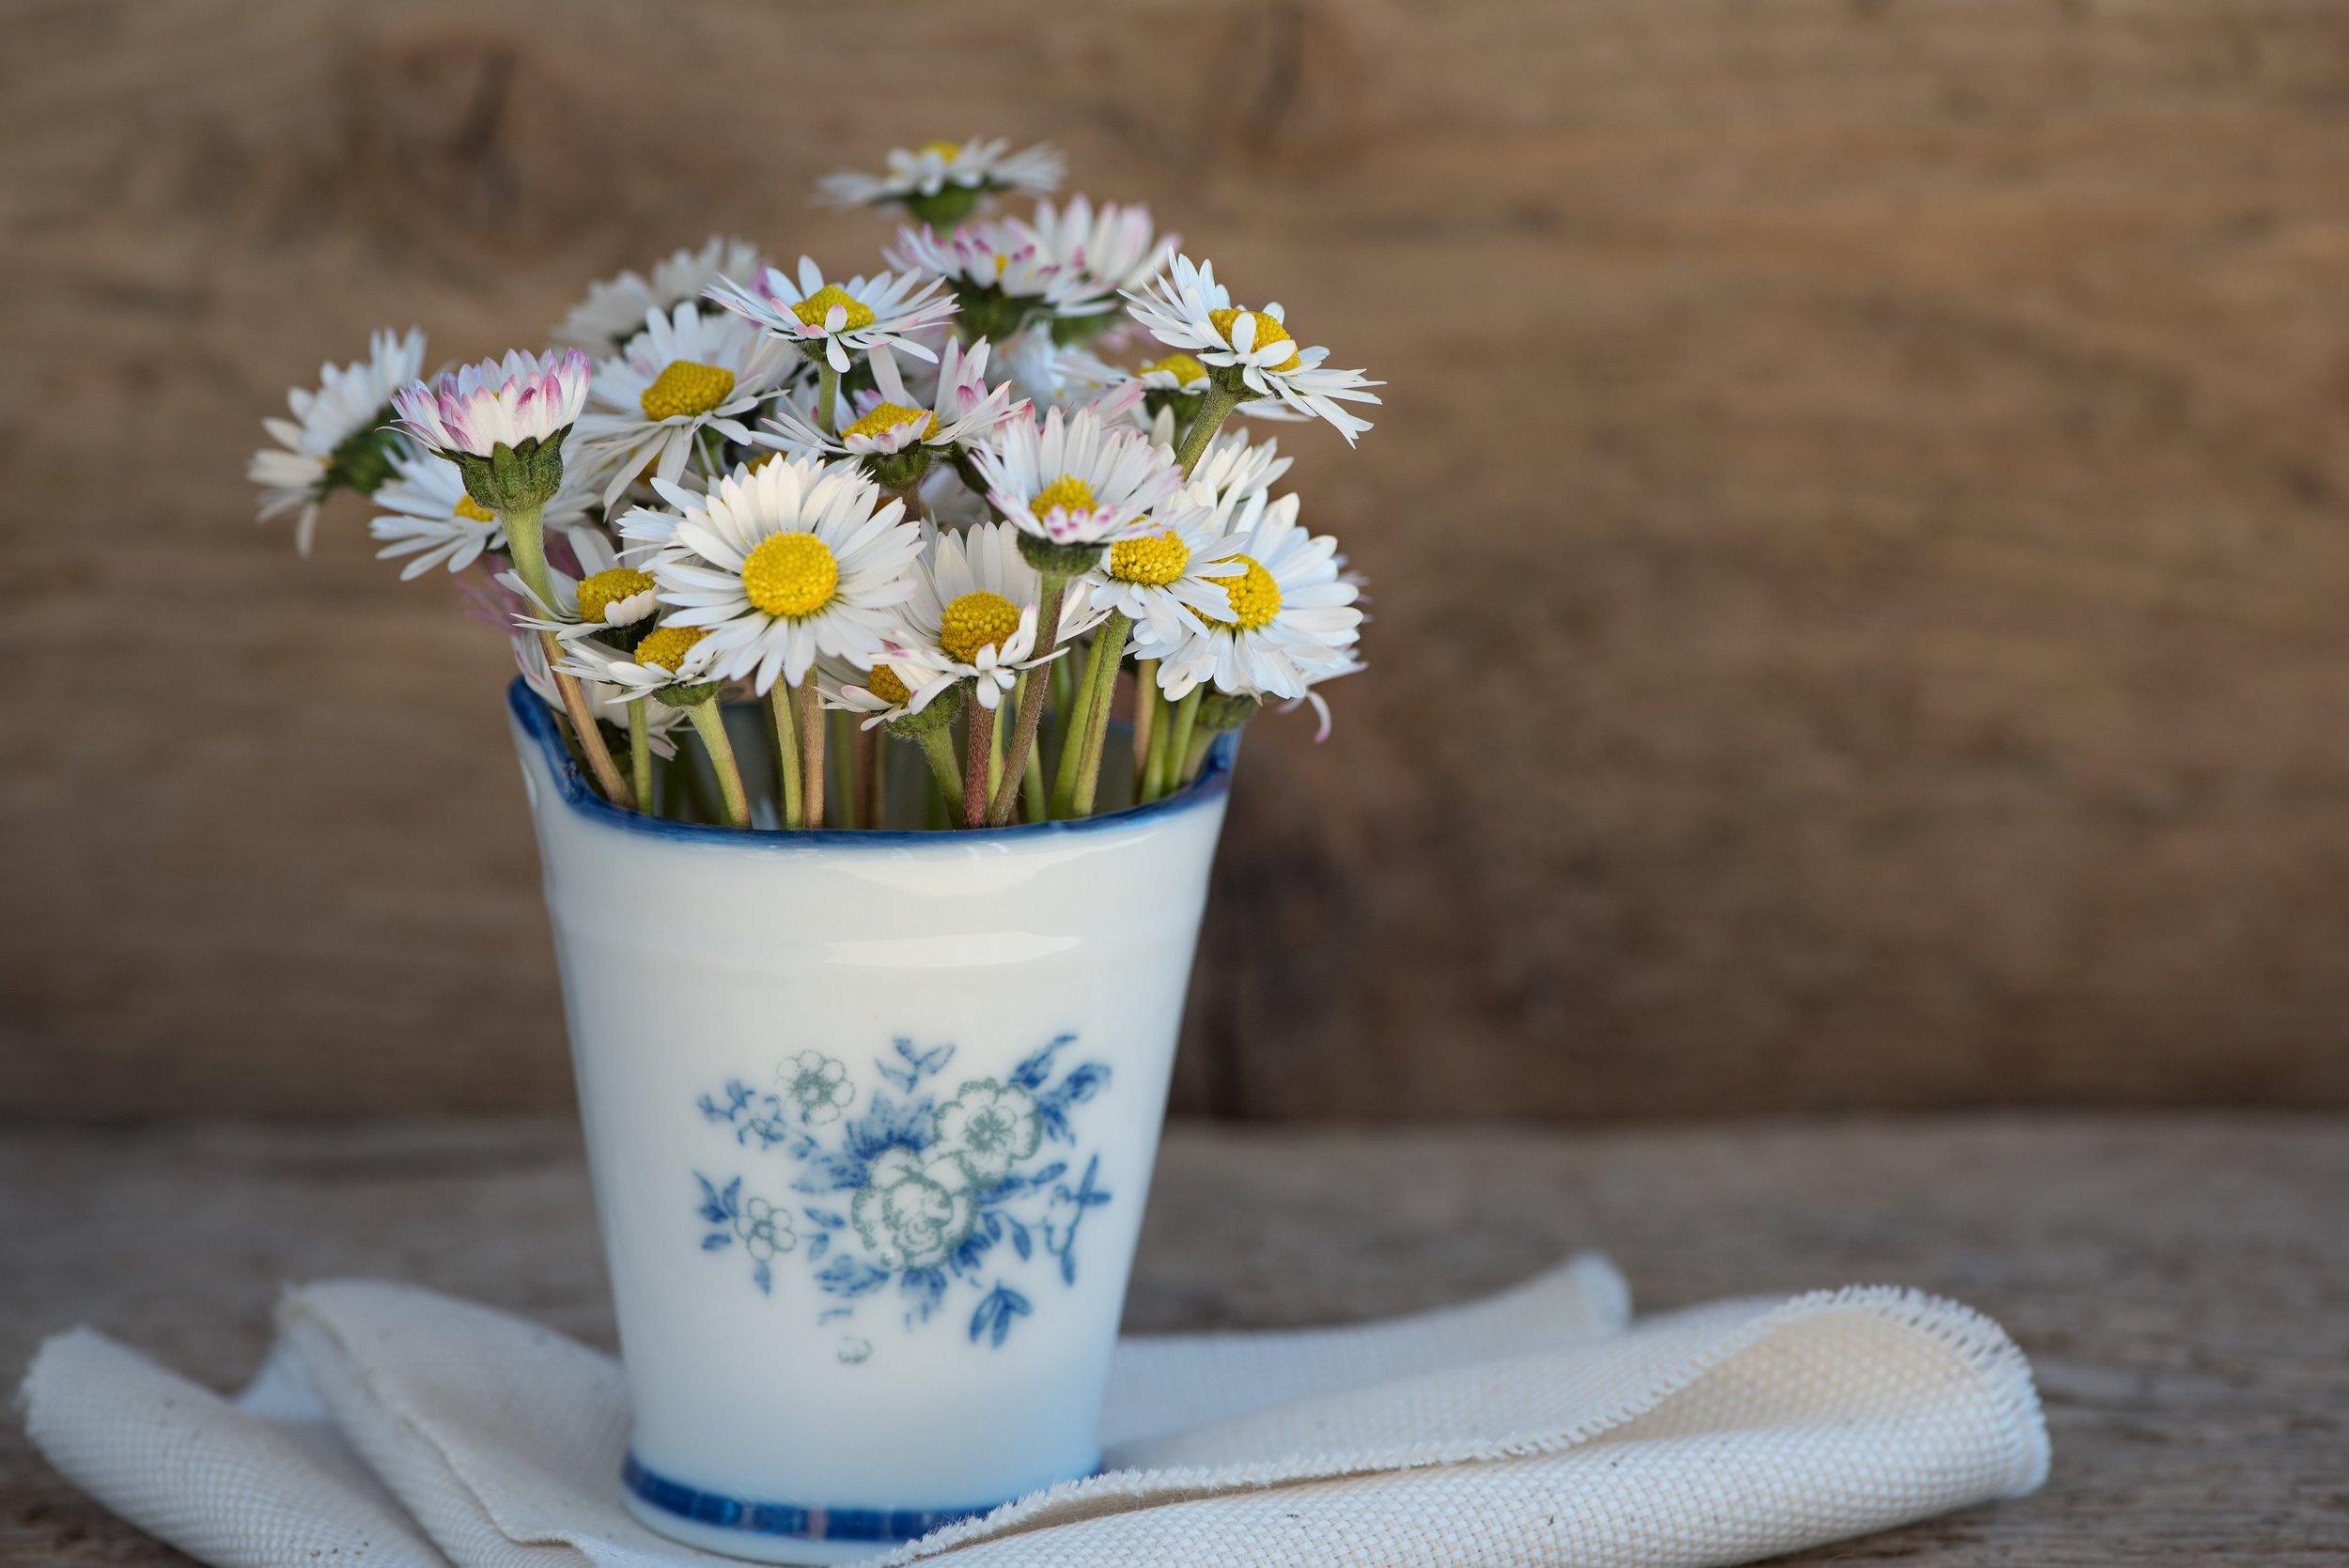 bloom-blossom-daisies-99565.jpg